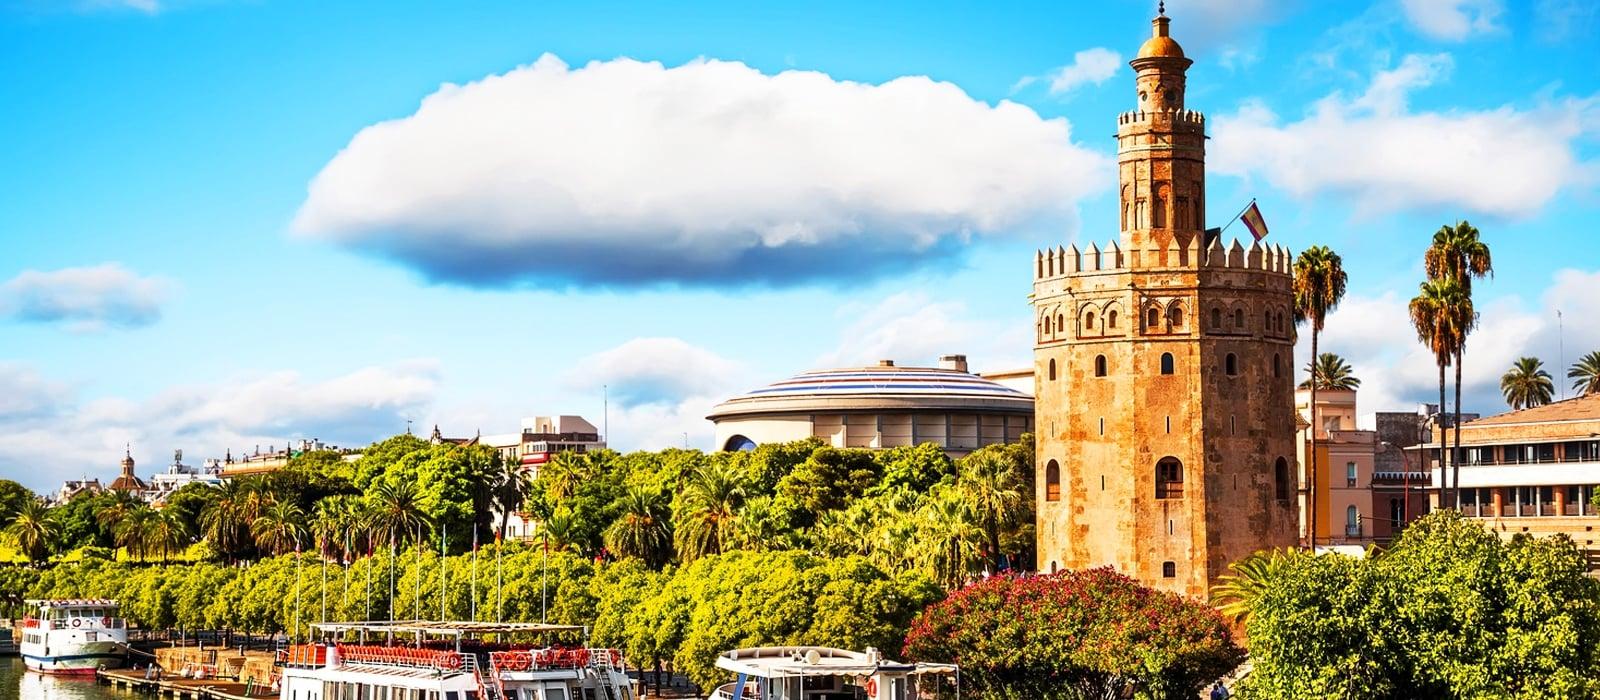 Sevilla - Vincci Hoteles